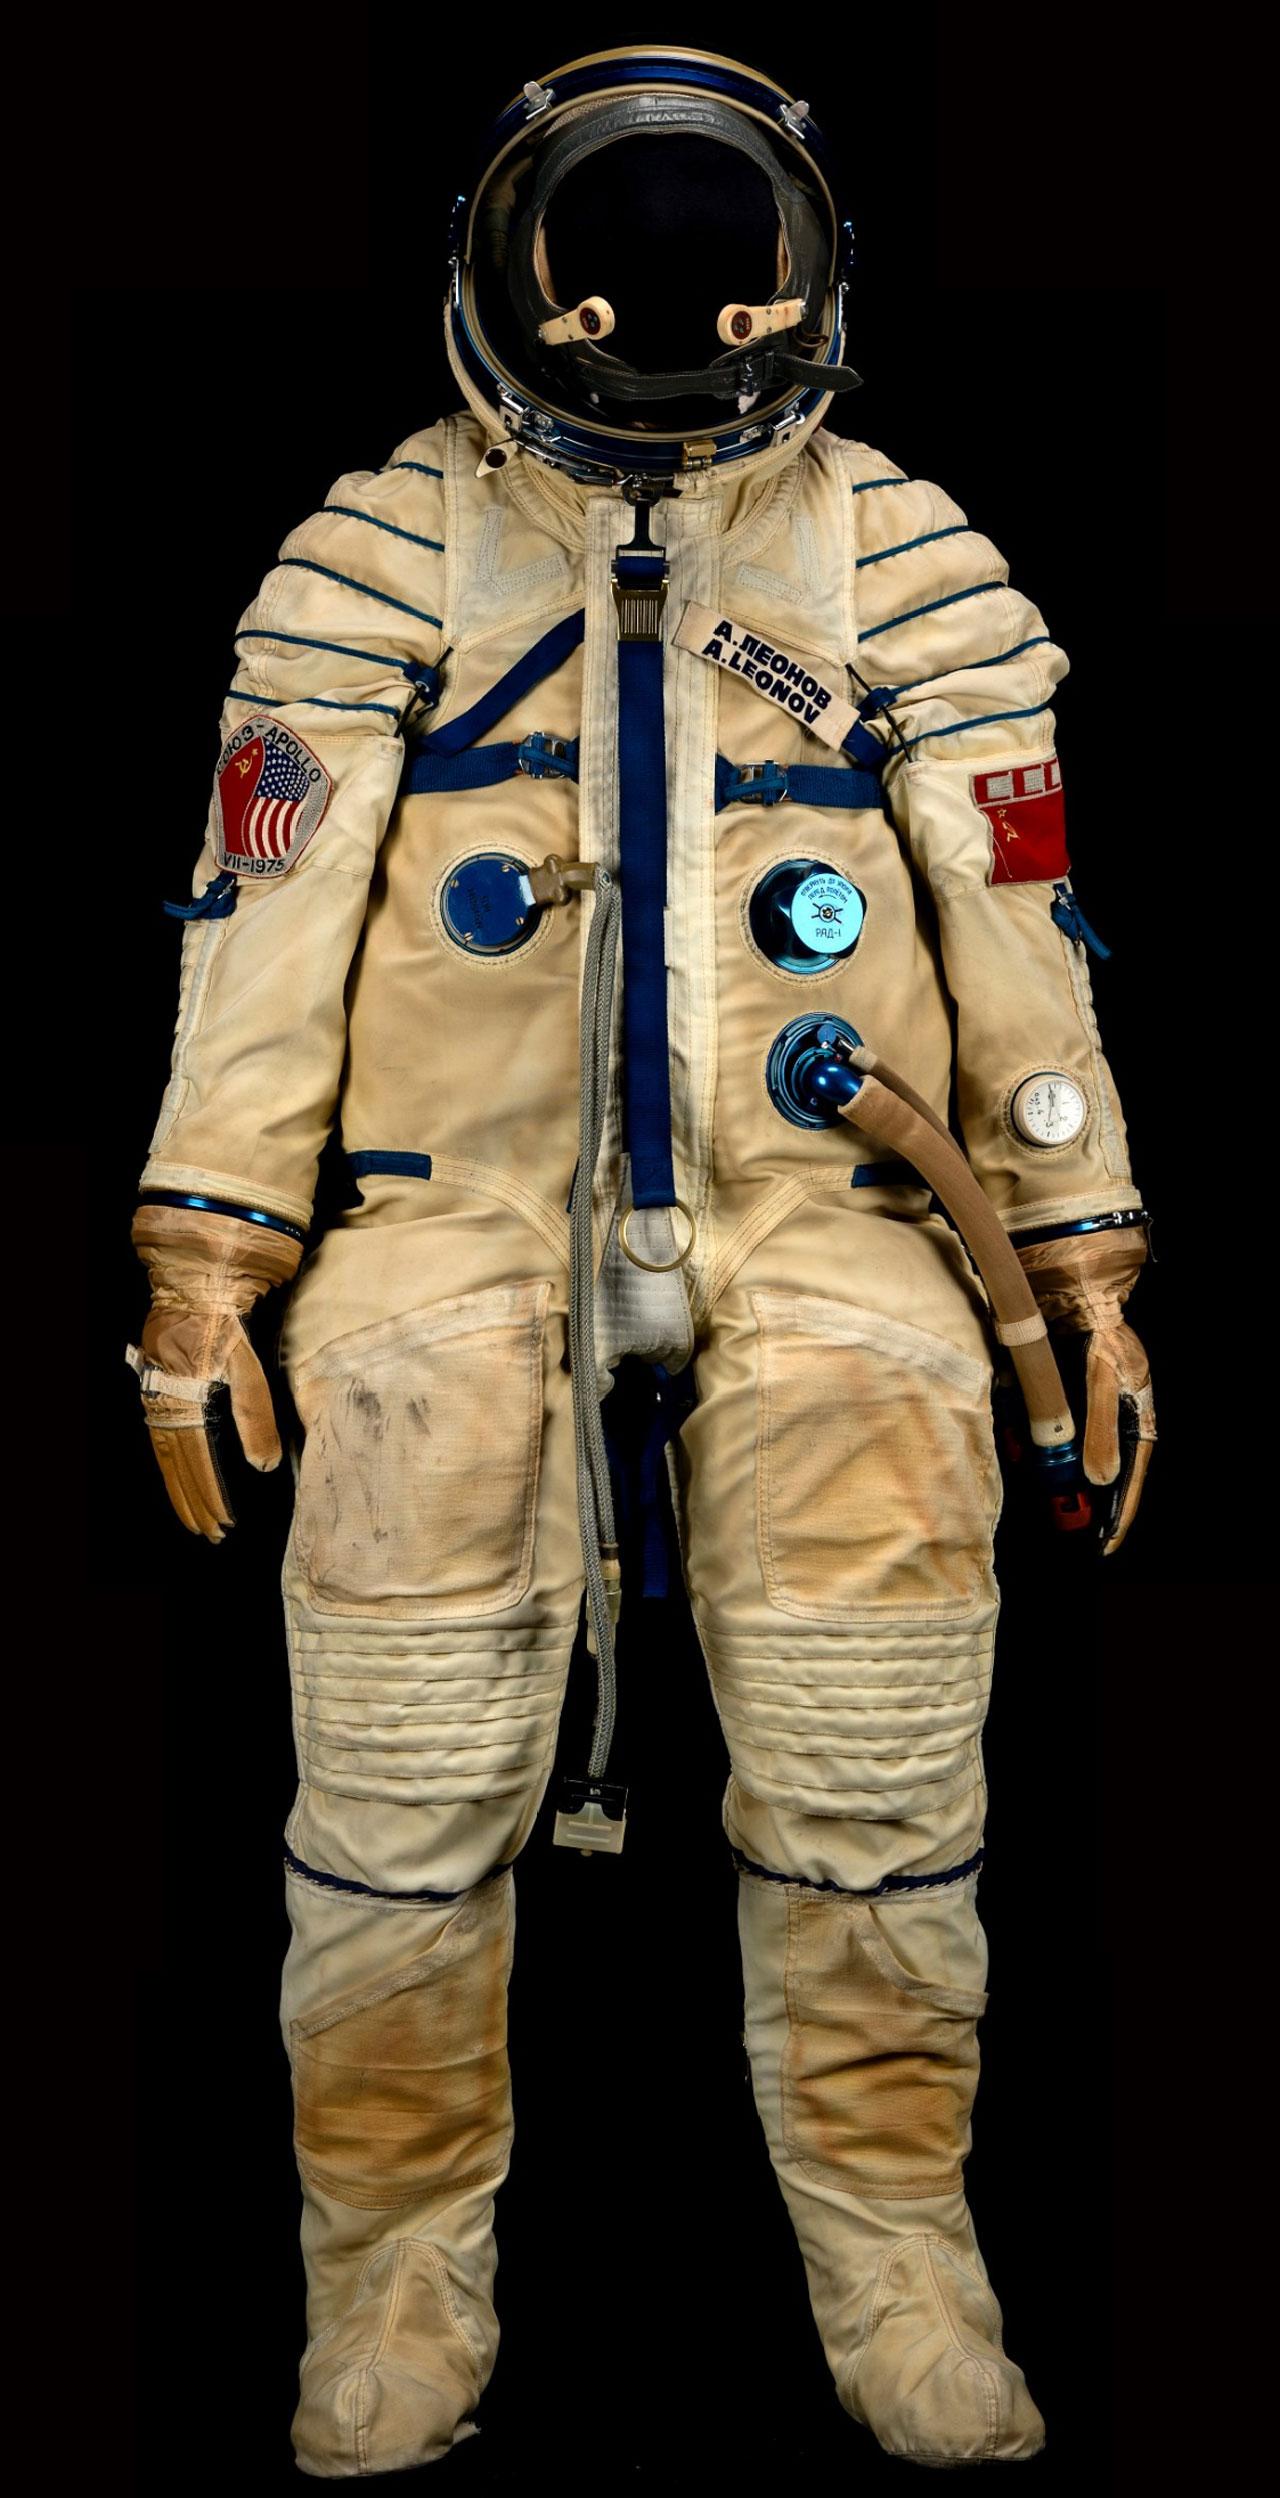 cosmonaut space suit silhouette - photo #5